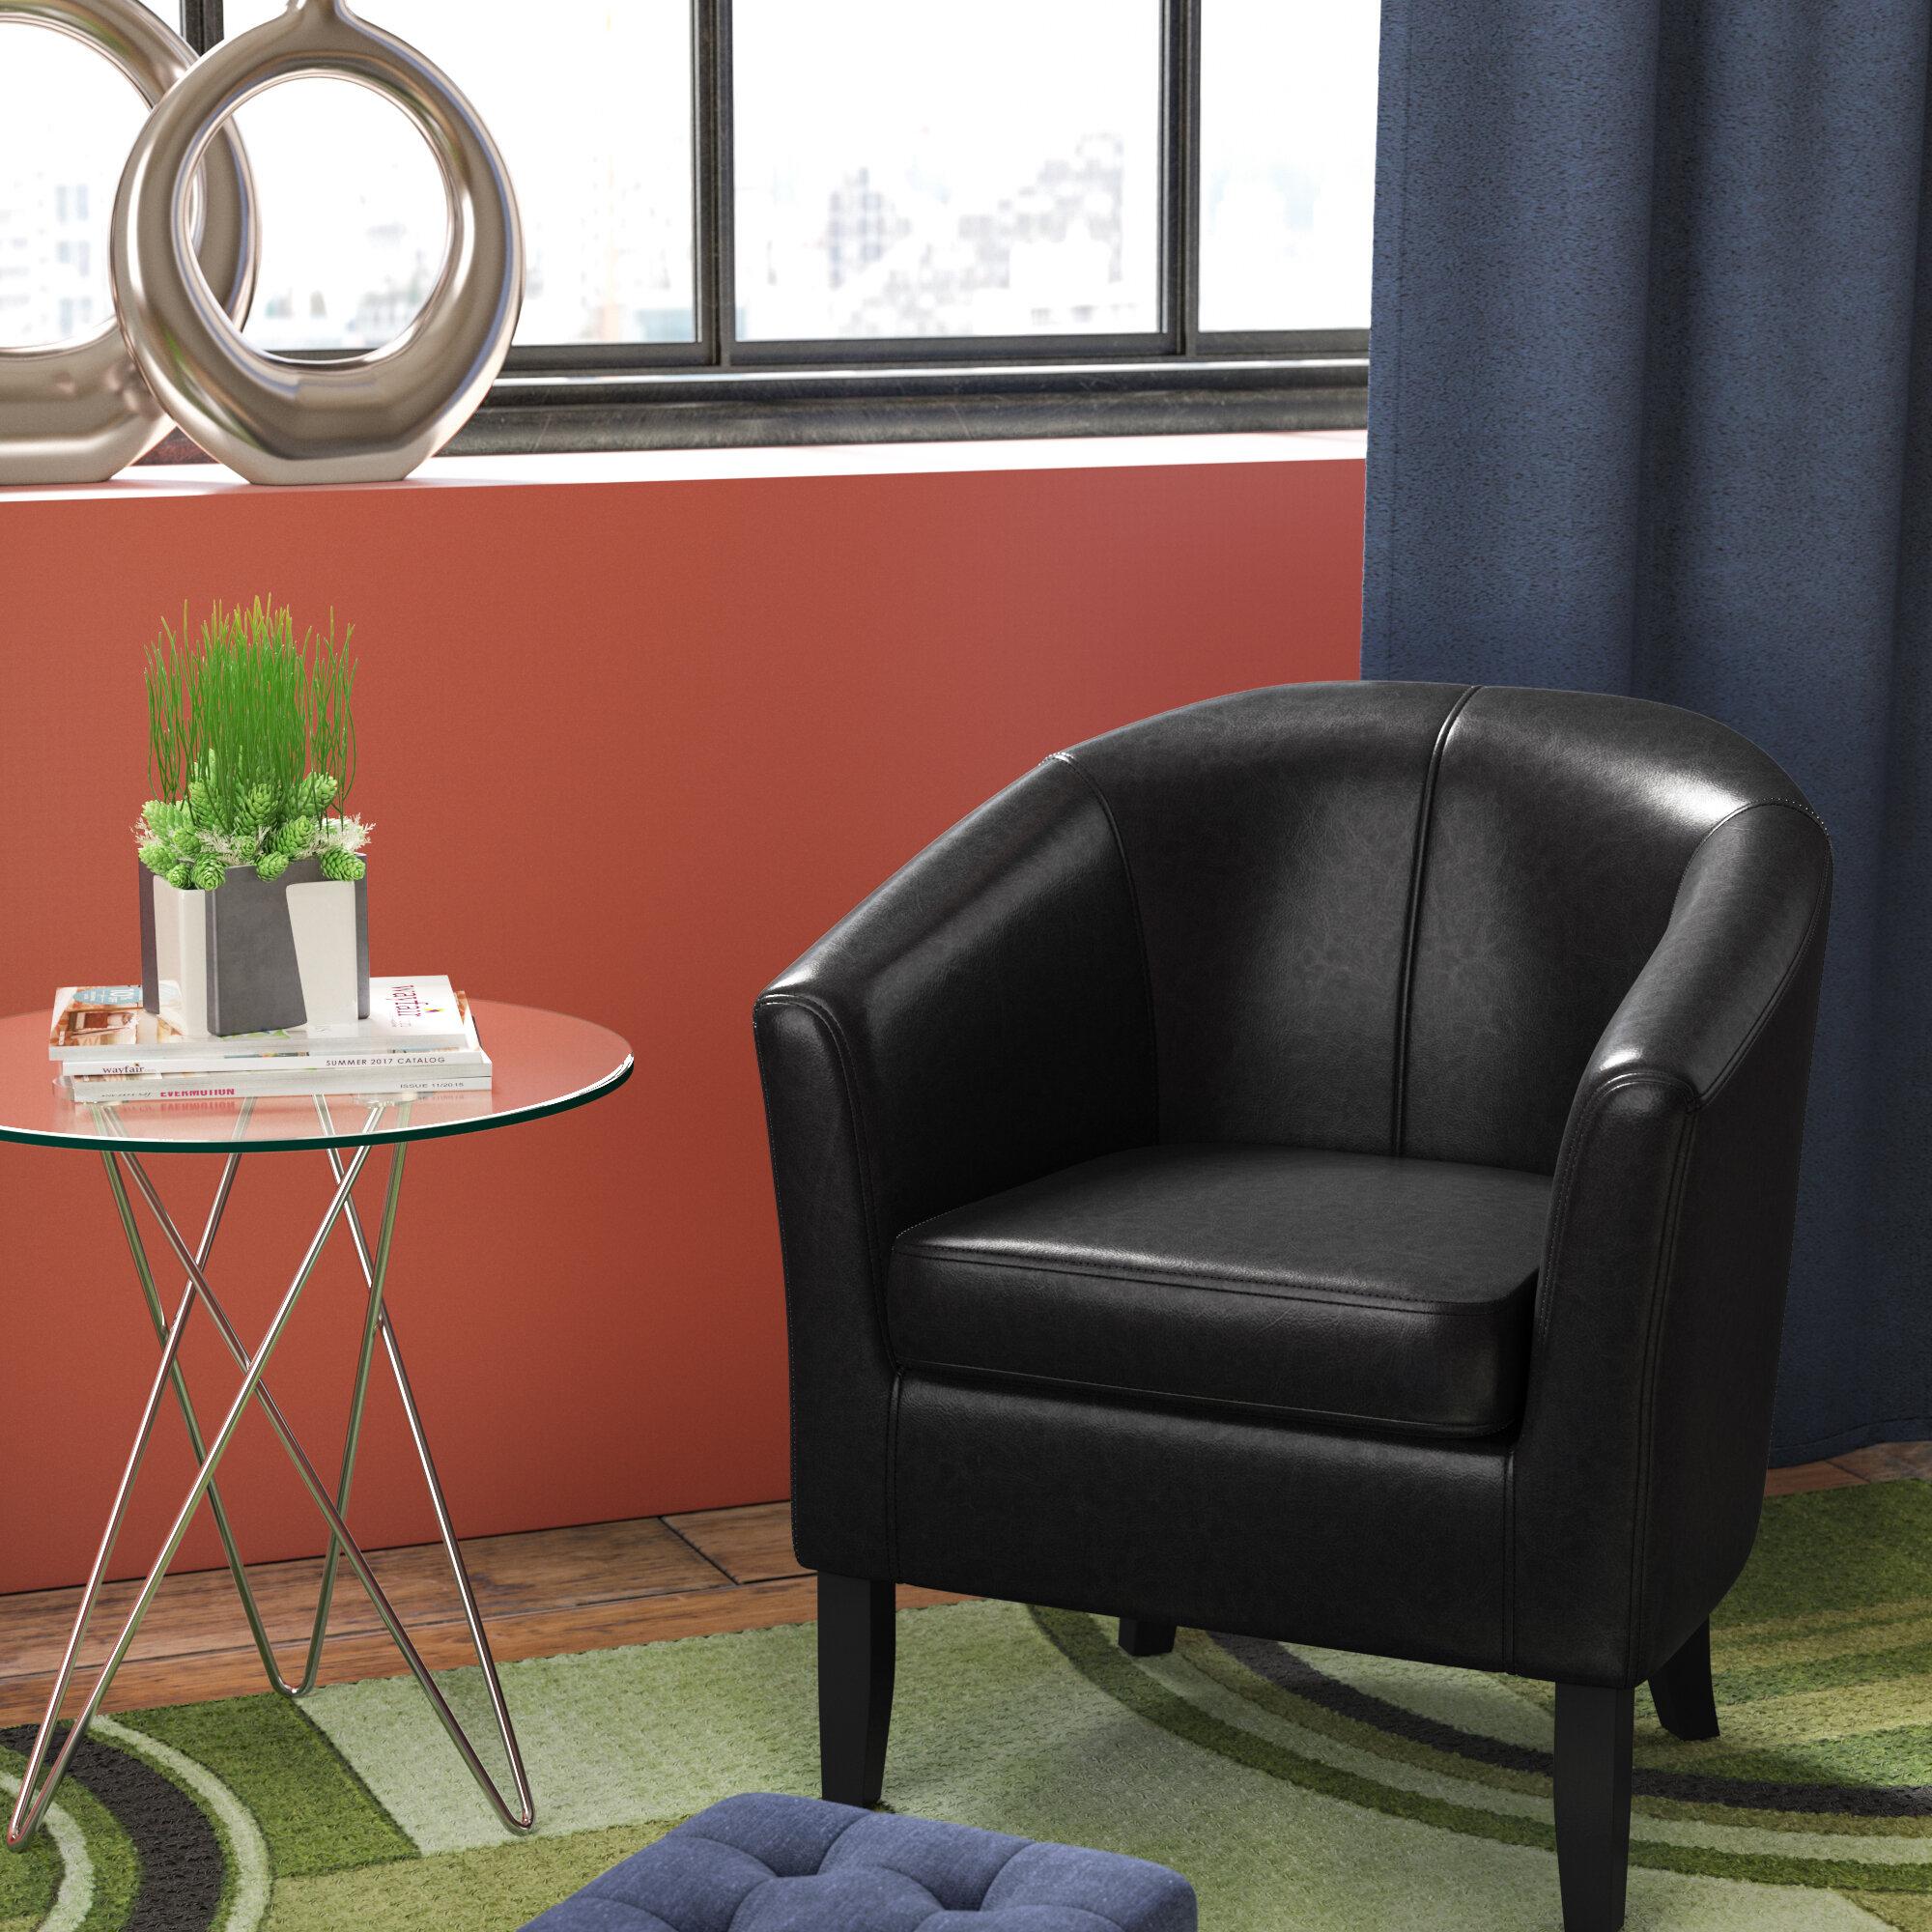 "Munson 26"" W Faux Leather Barrel Chair With Regard To Liam Faux Leather Barrel Chairs (View 9 of 15)"